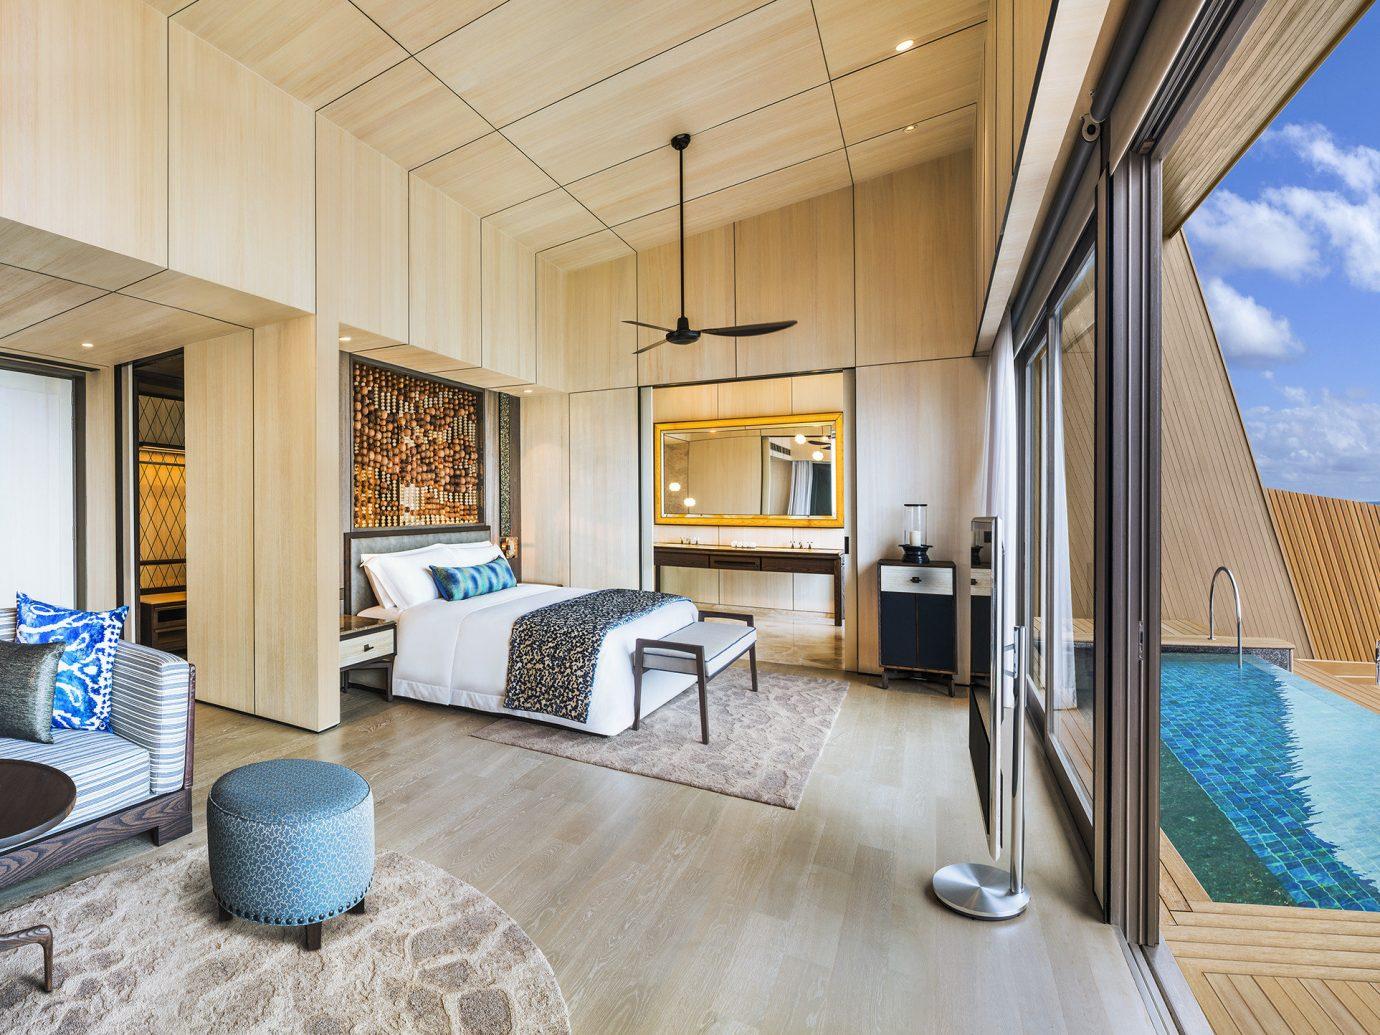 Bedroom at Jumeirah Vittaveli